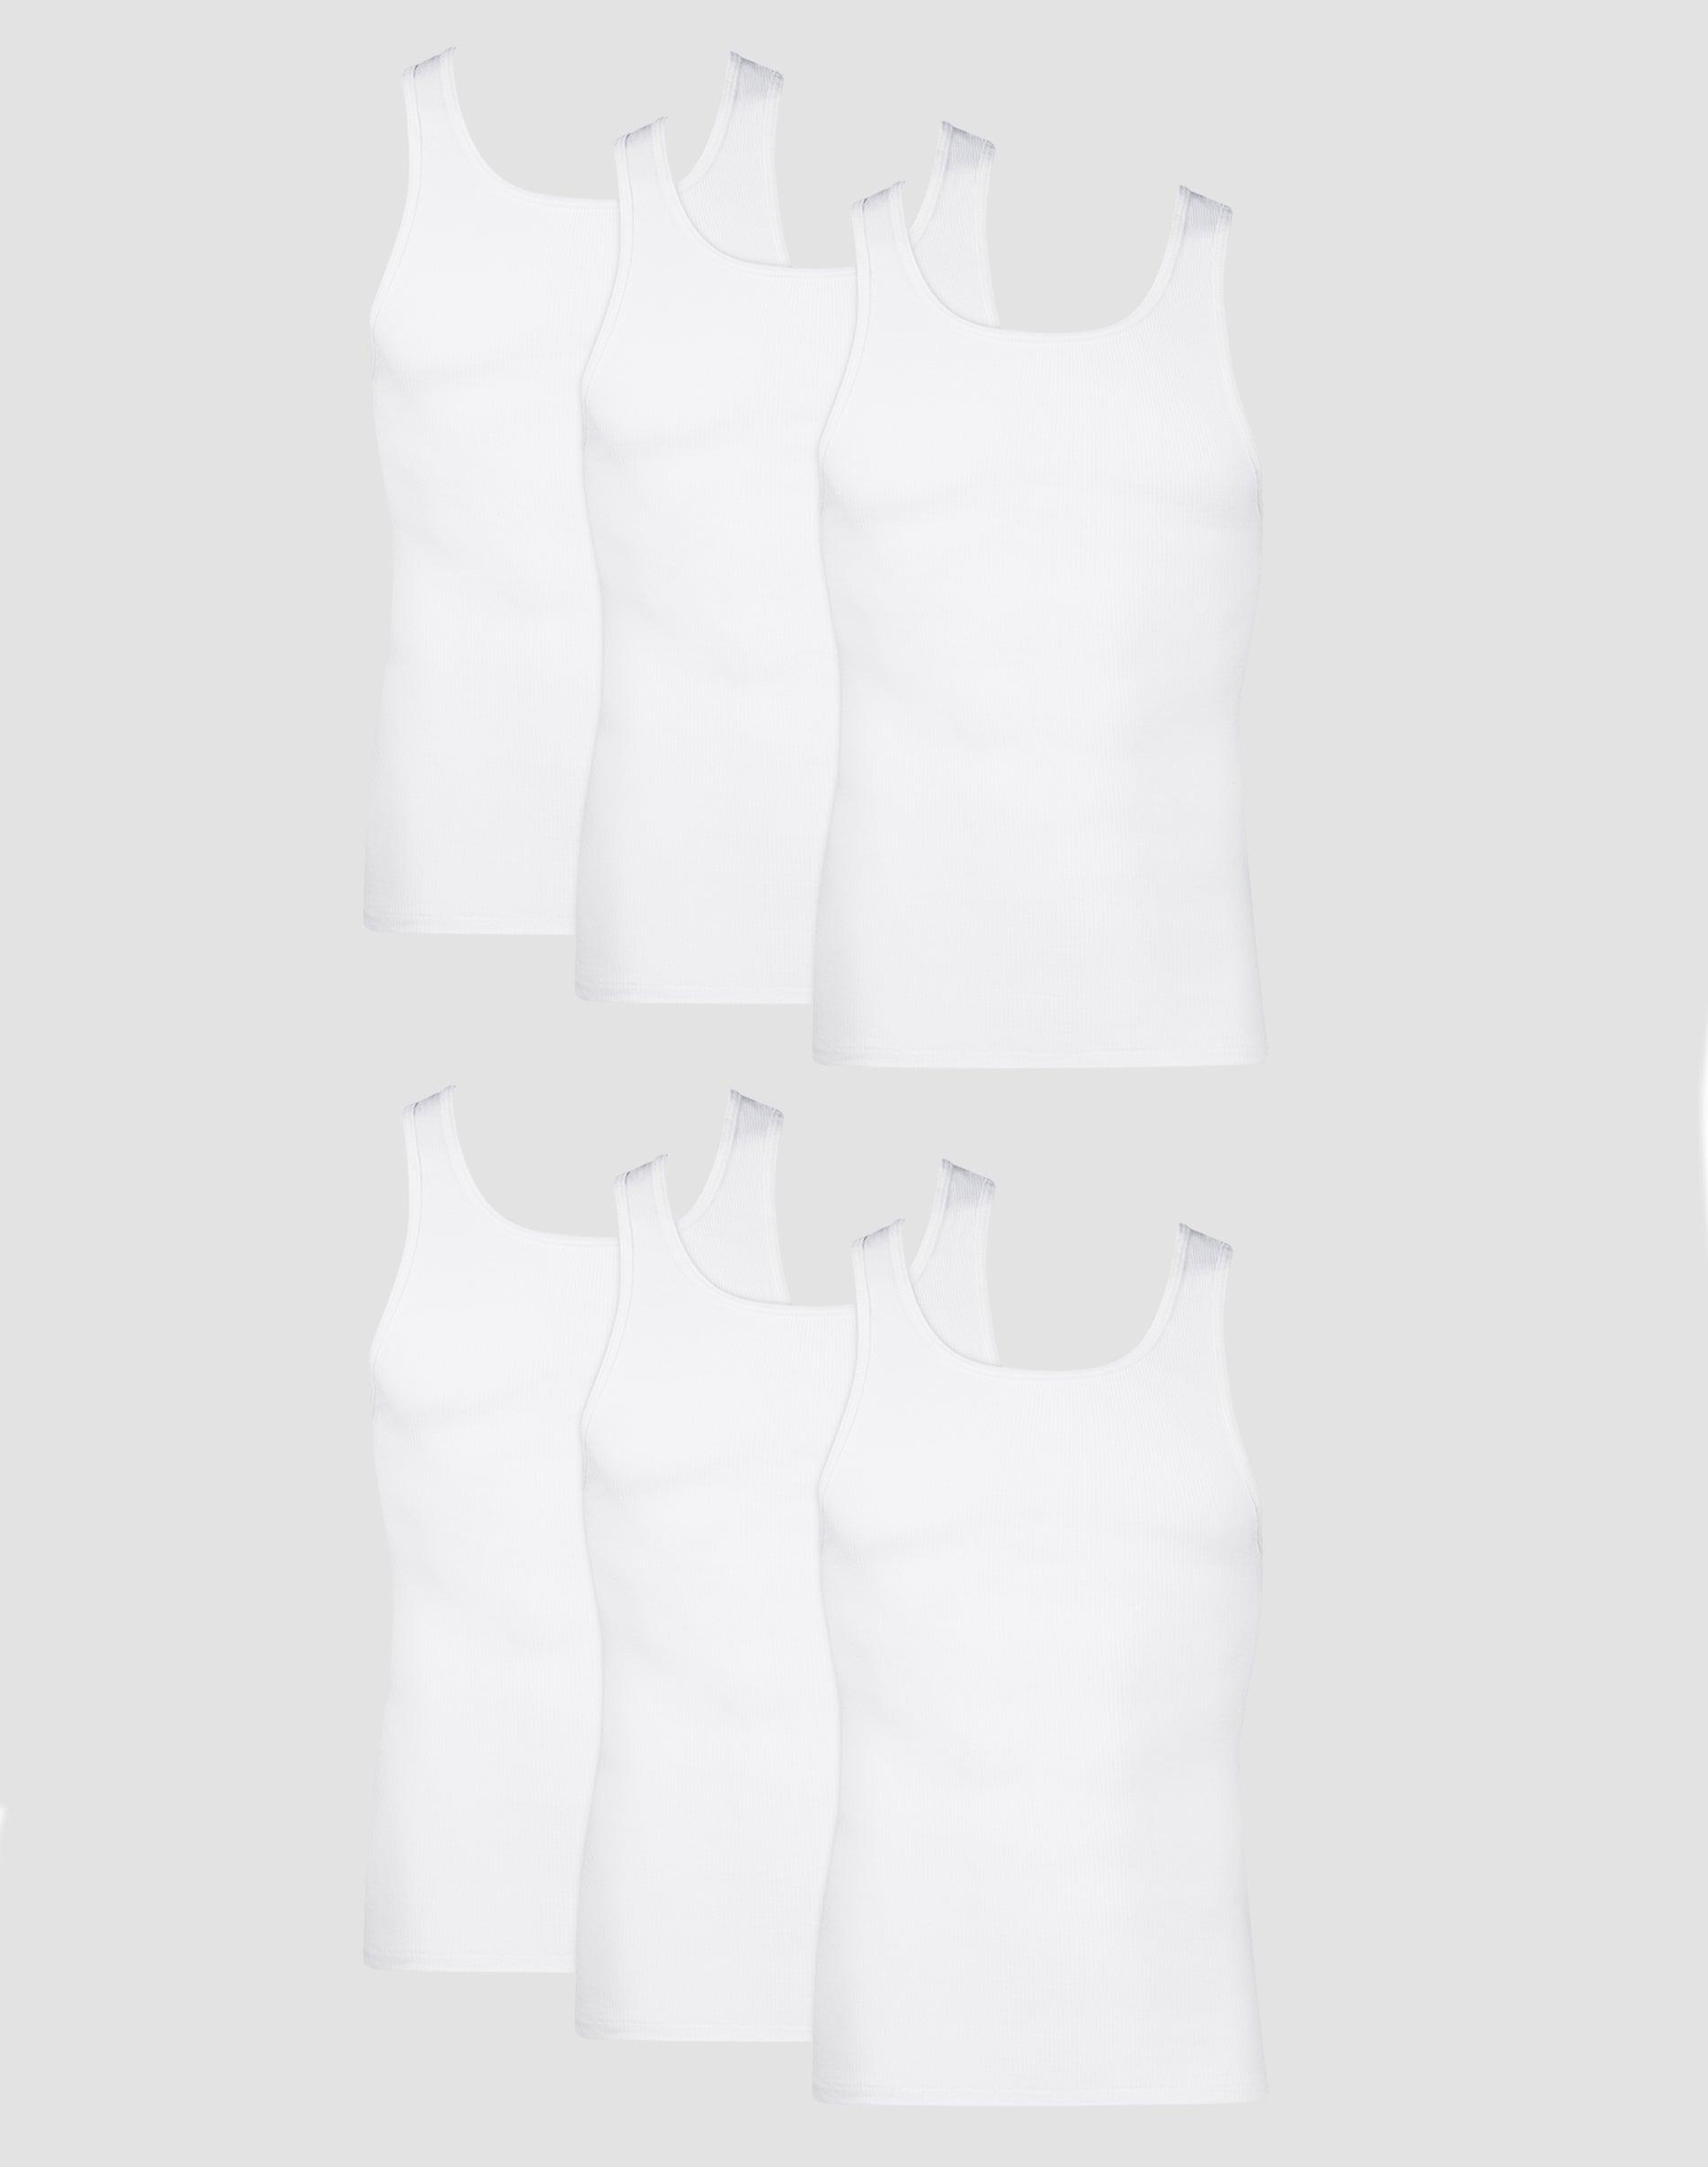 Hanes Boys Tagless ComfortSoft A-Shirt 6-Pack